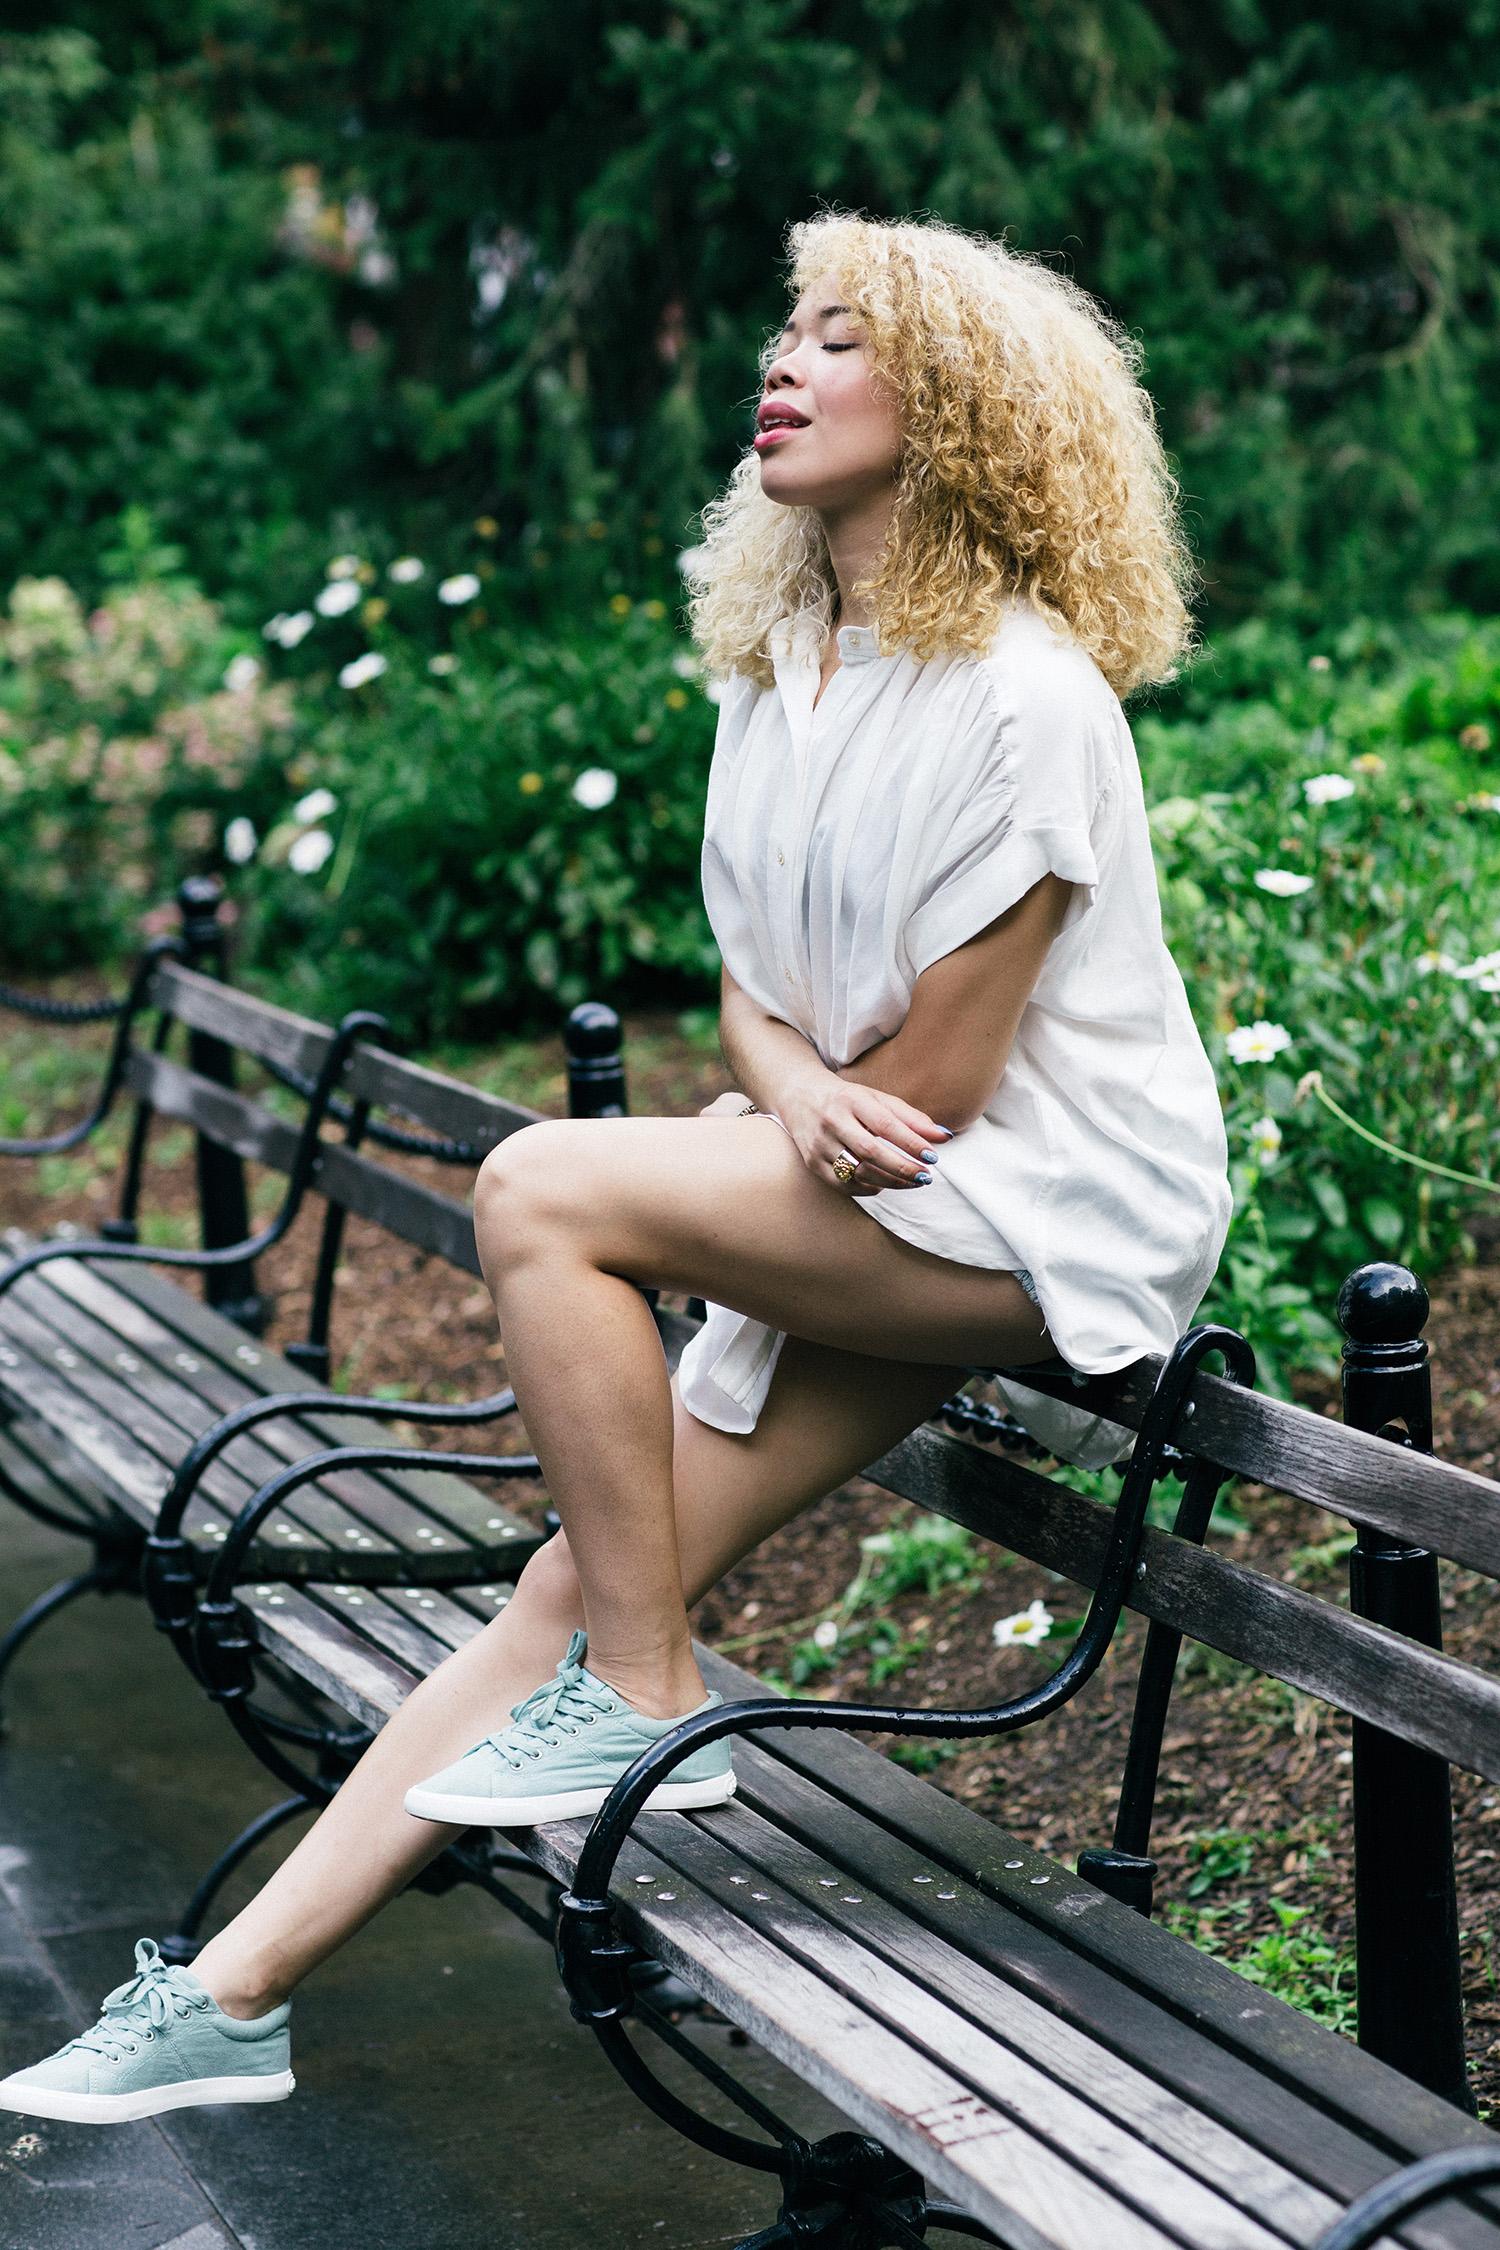 black_to_platinum_blonde_curly_hair_results.jpg